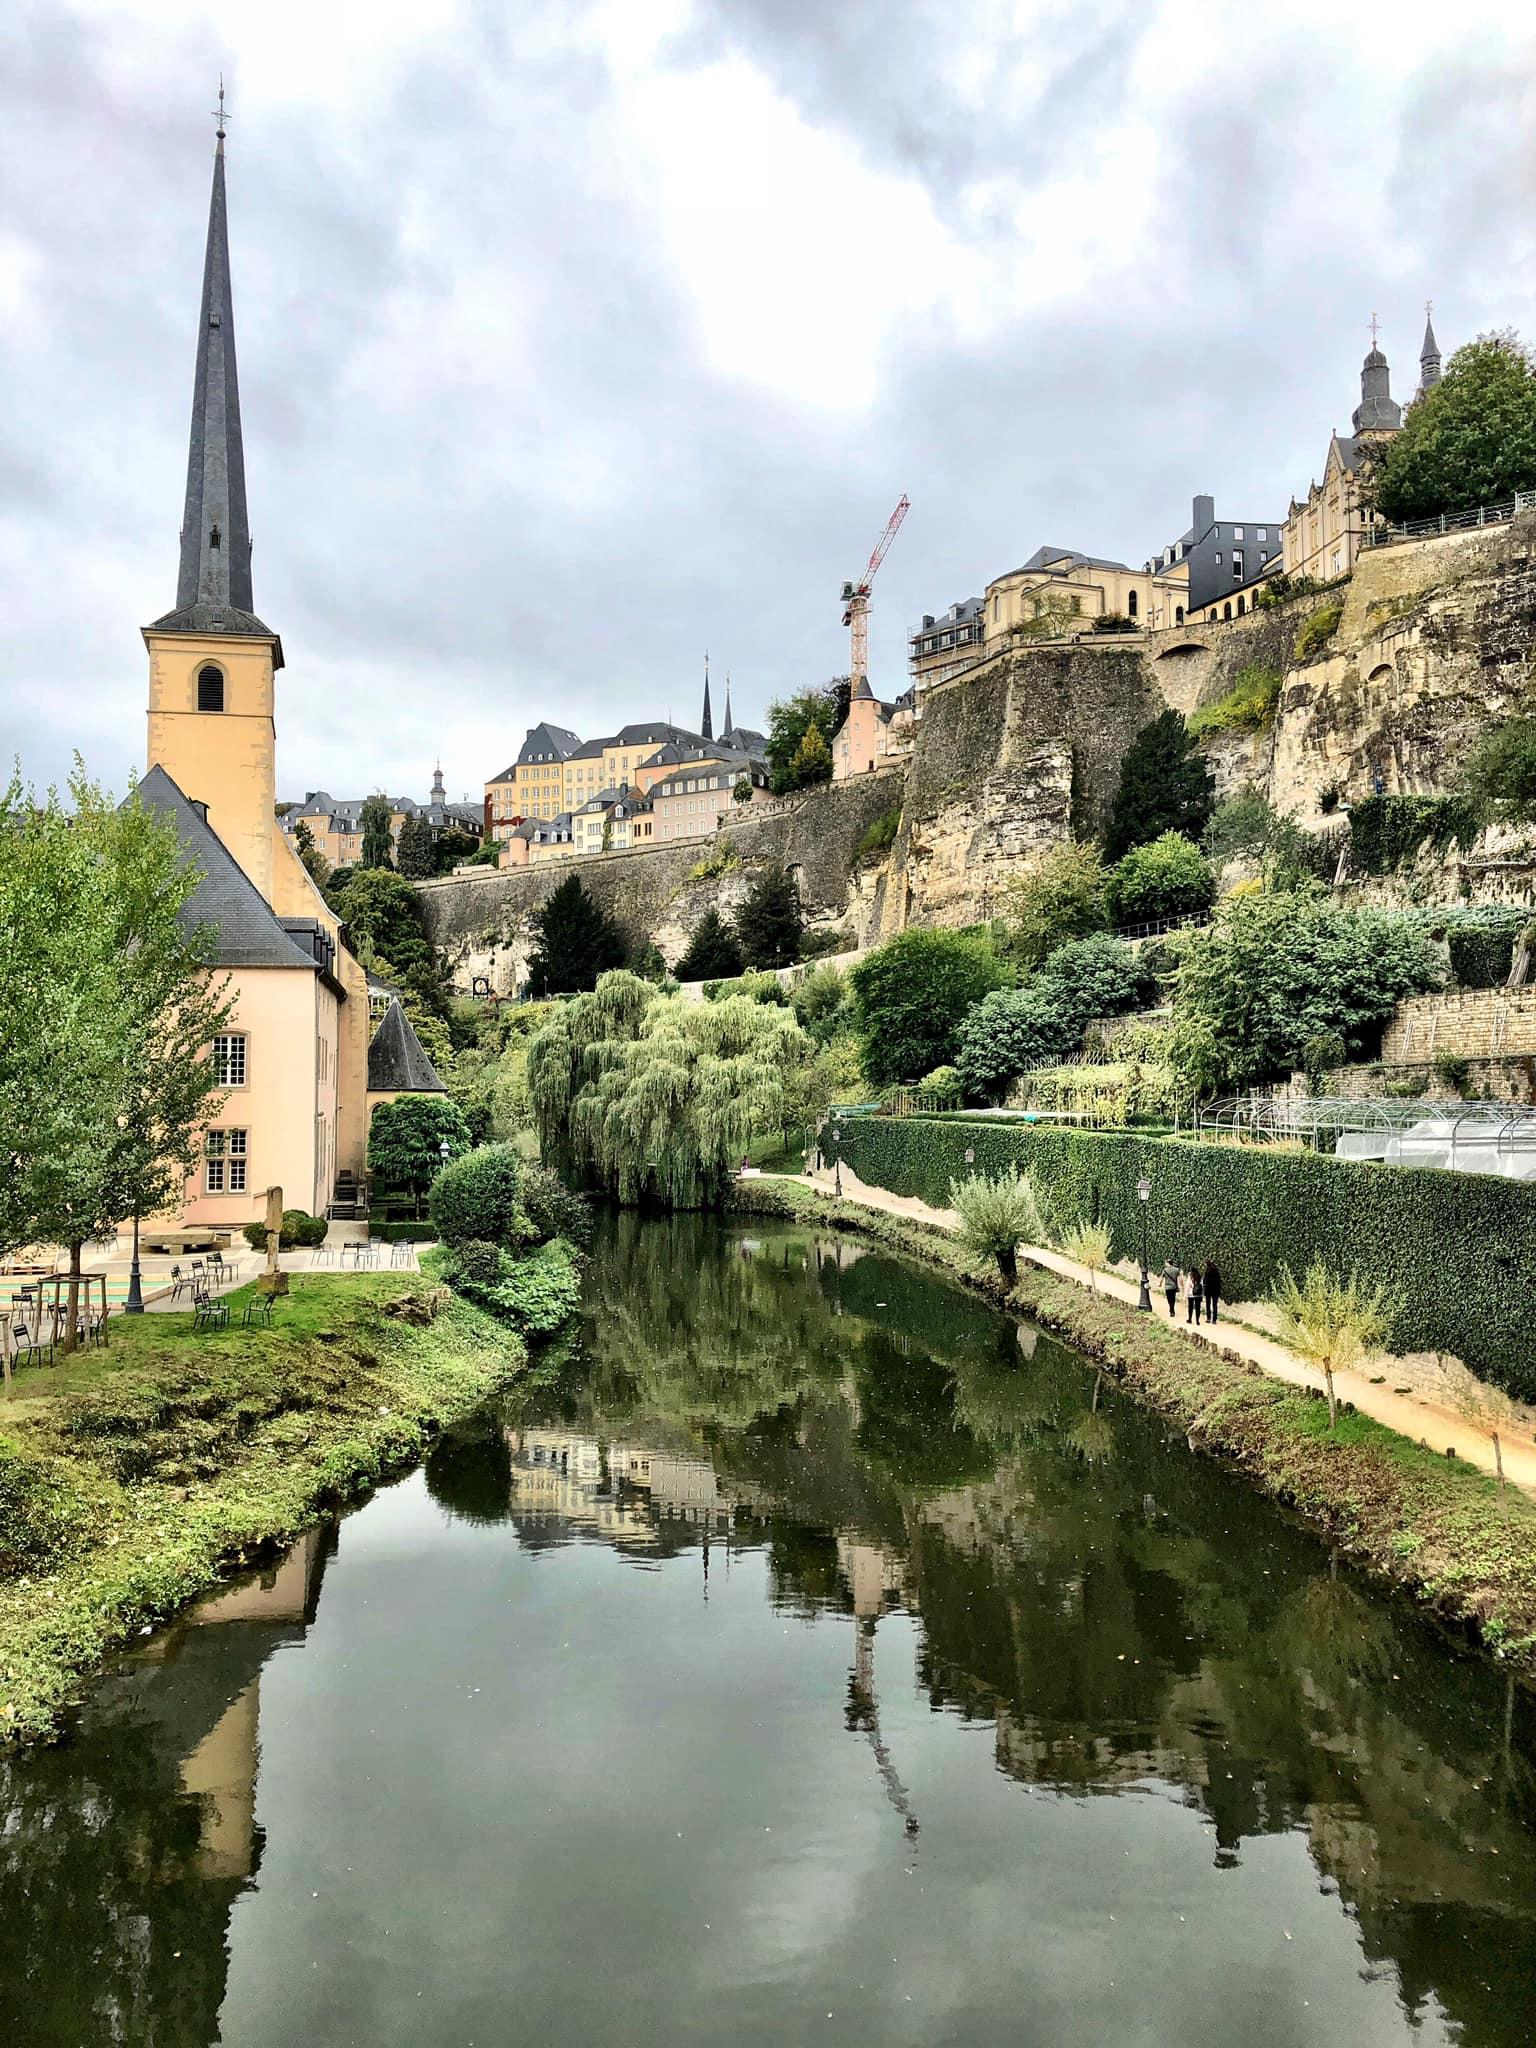 grund luxembourg travel bruce maraise travel